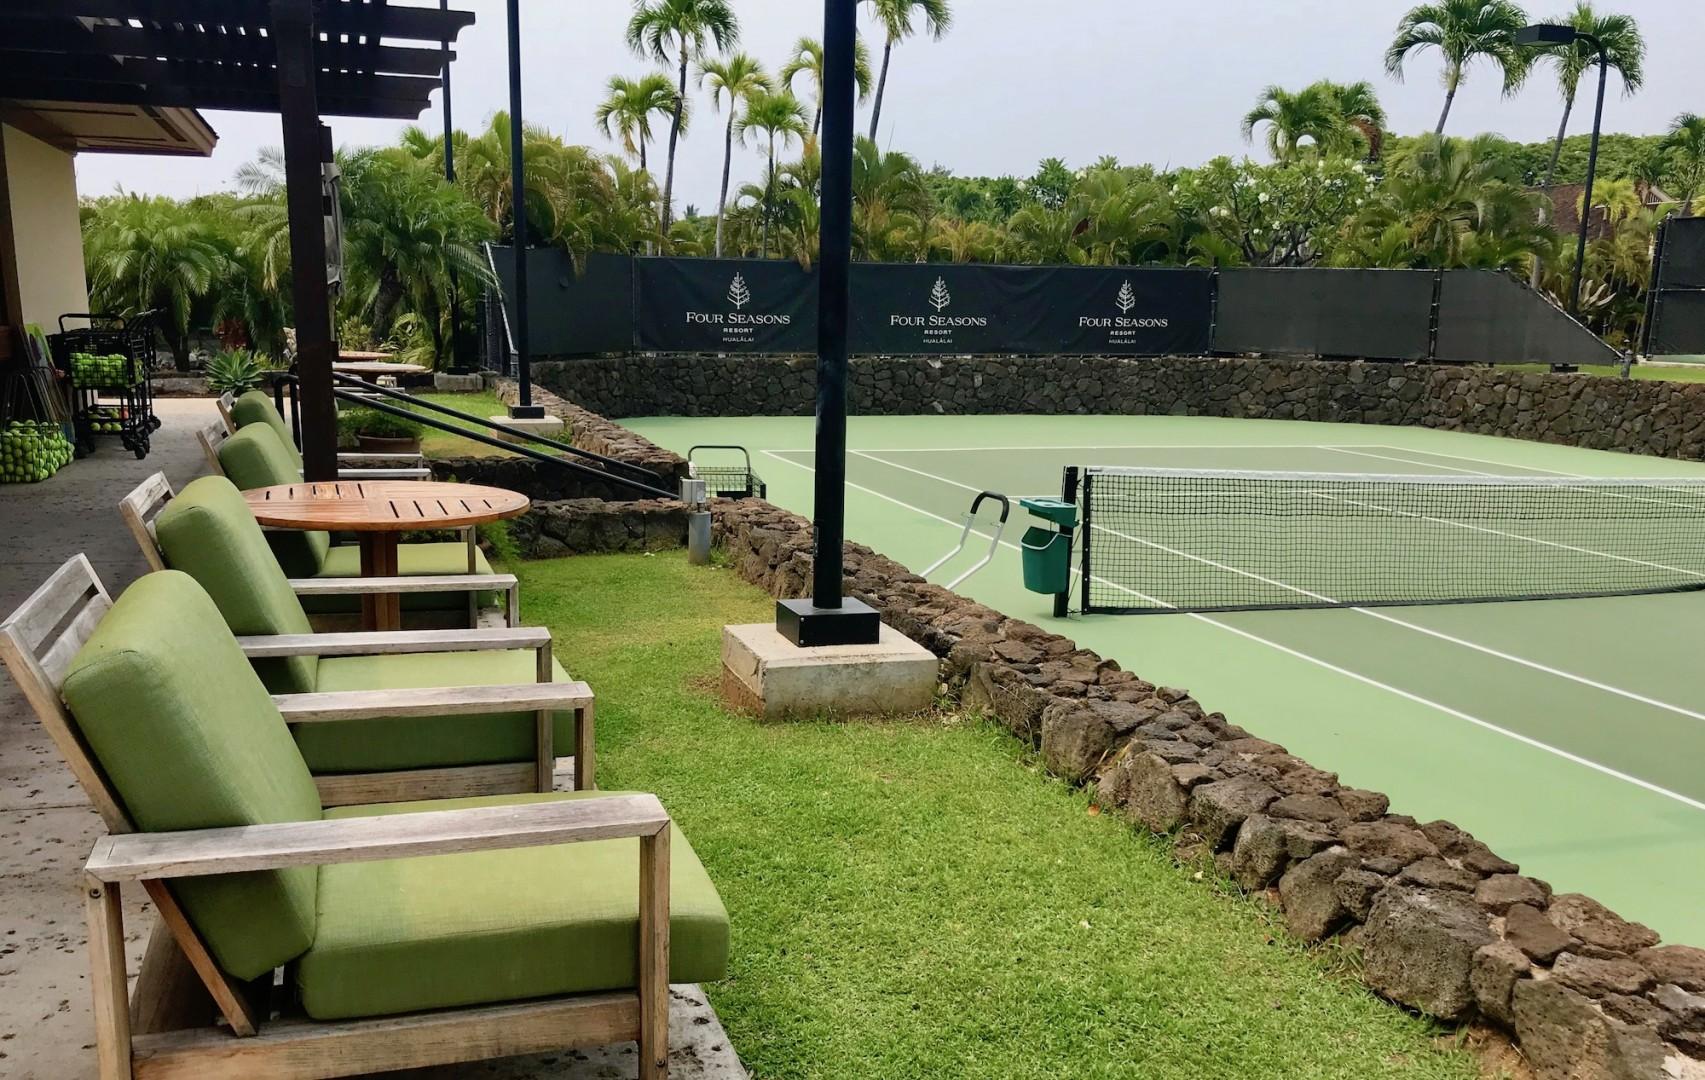 Four Seasons Resort Tennis Courts